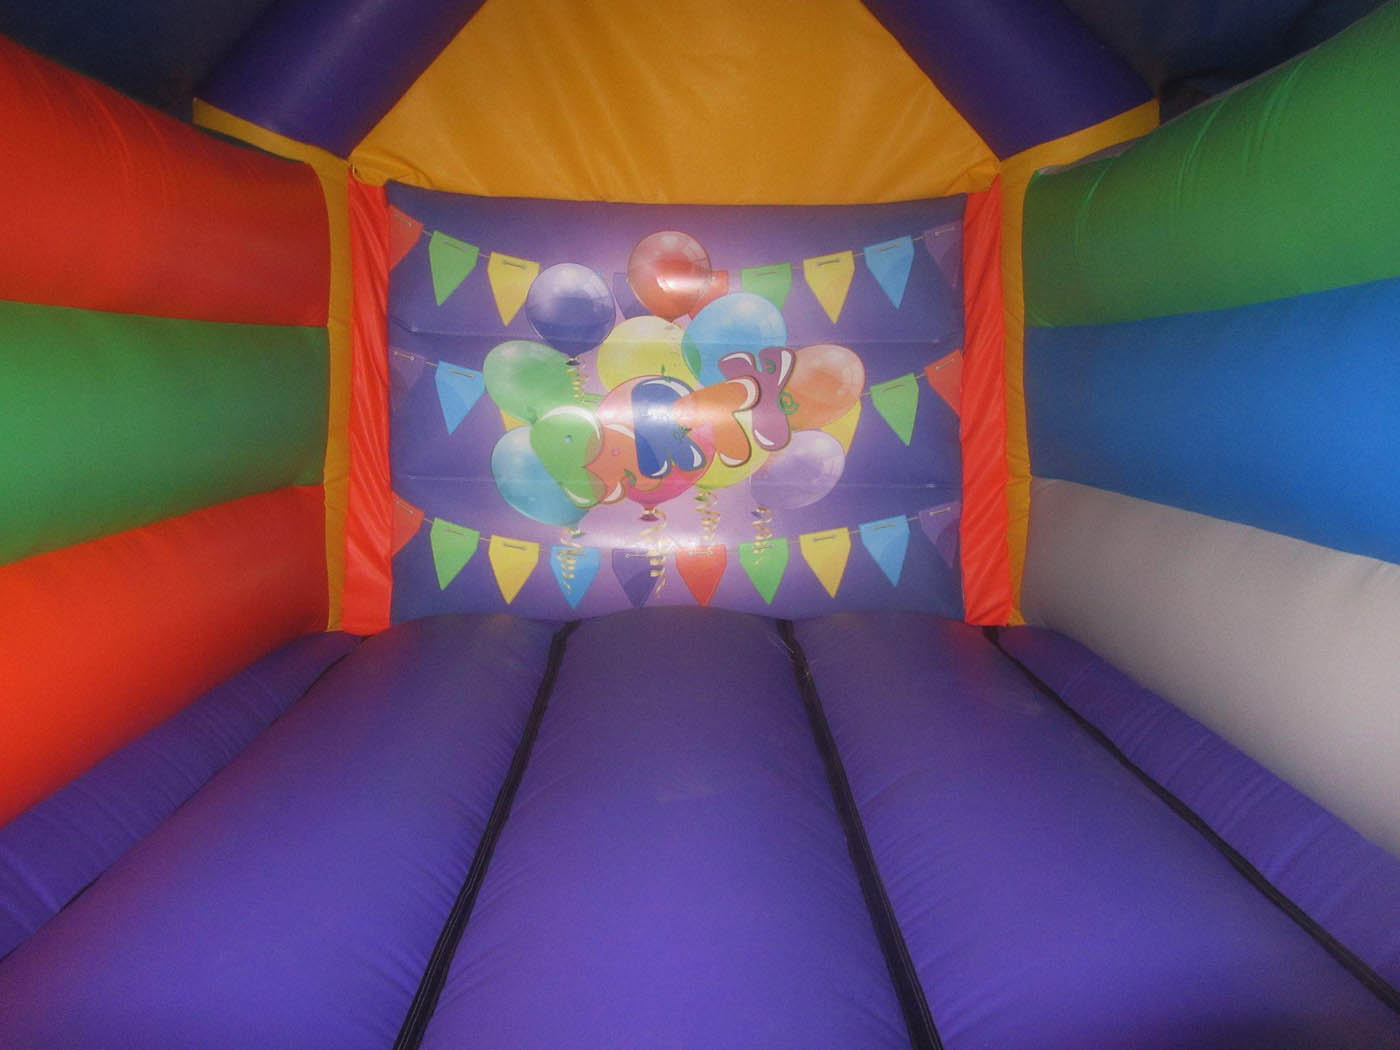 15x11-orange-purple-party-bouncy-castle-bw-compressor